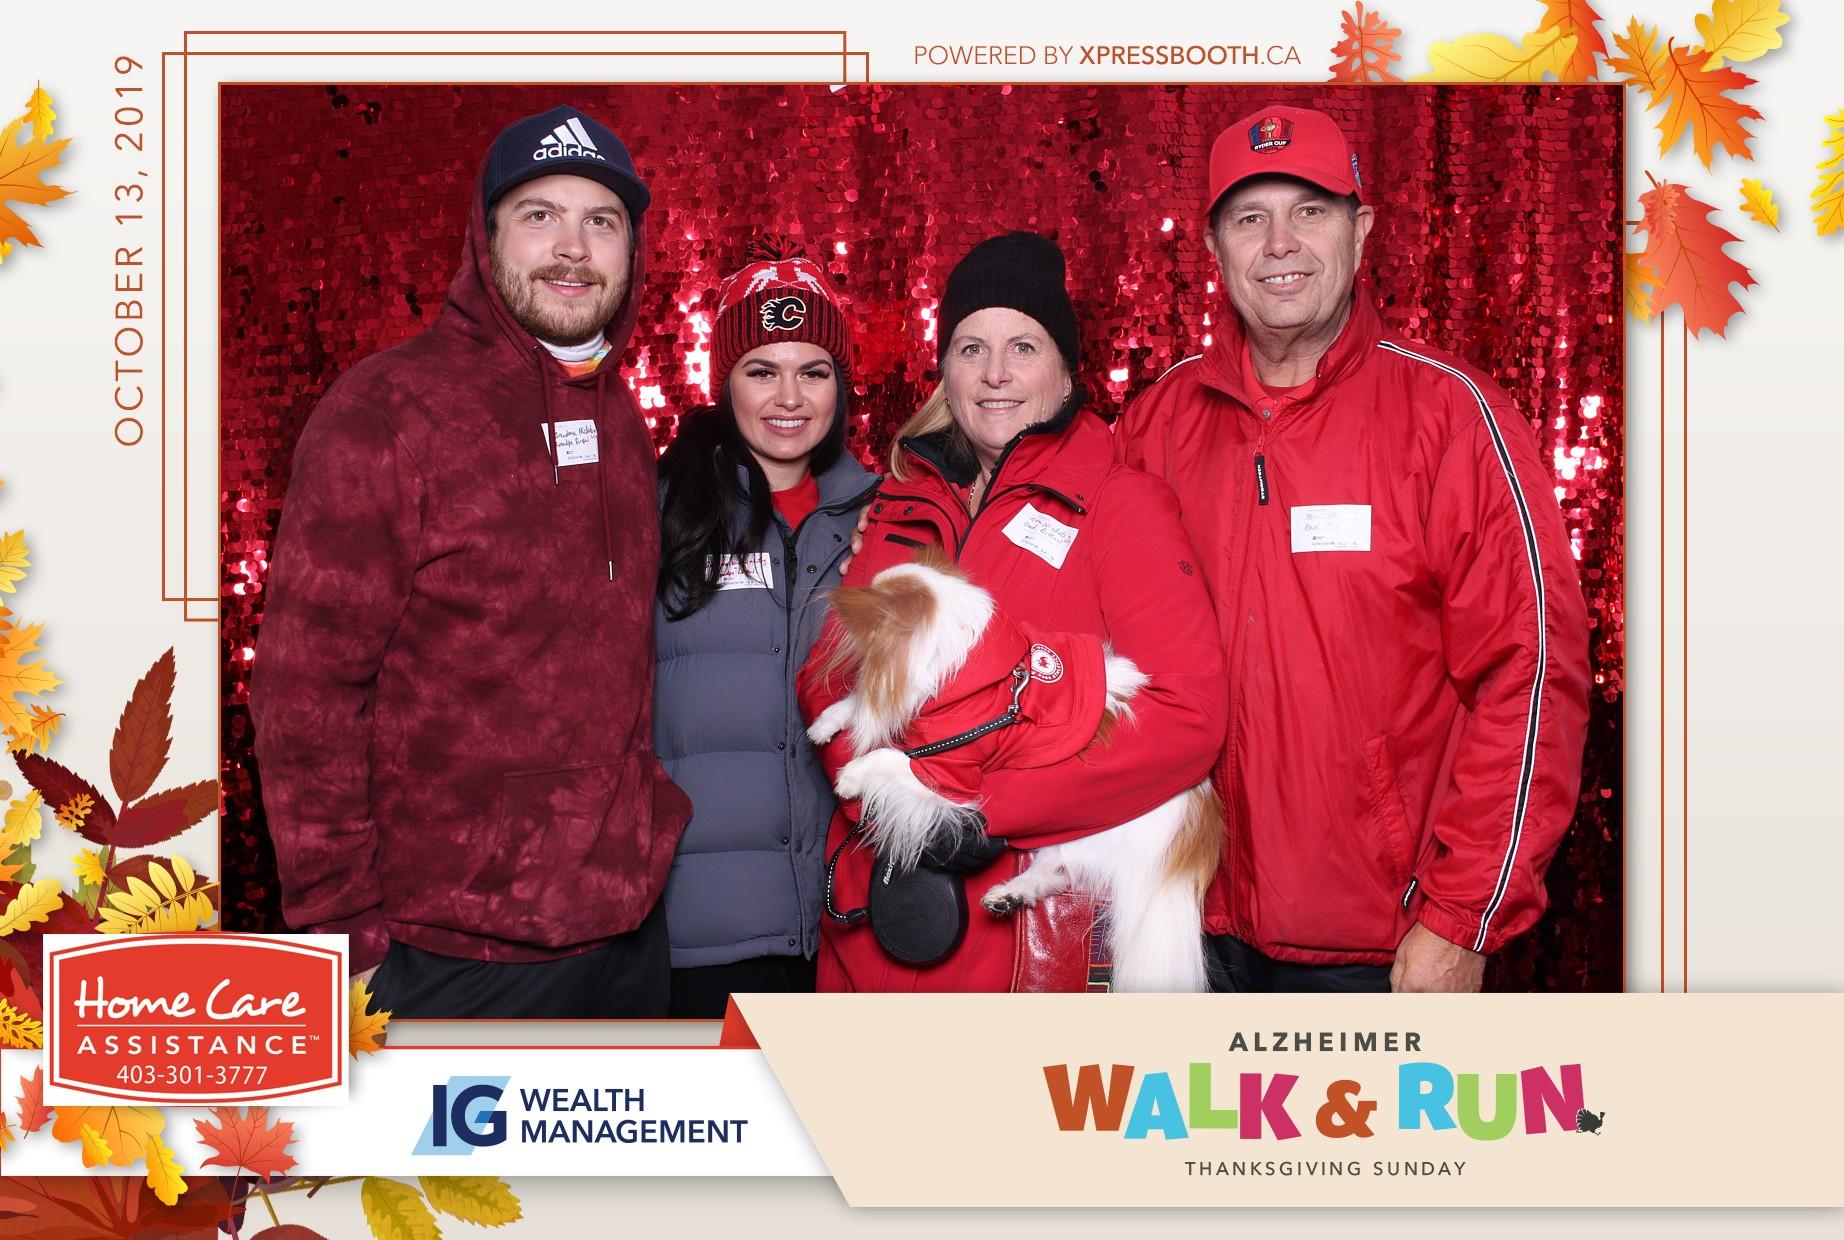 WalkRunAlzheimerSociety-0131-PRINT